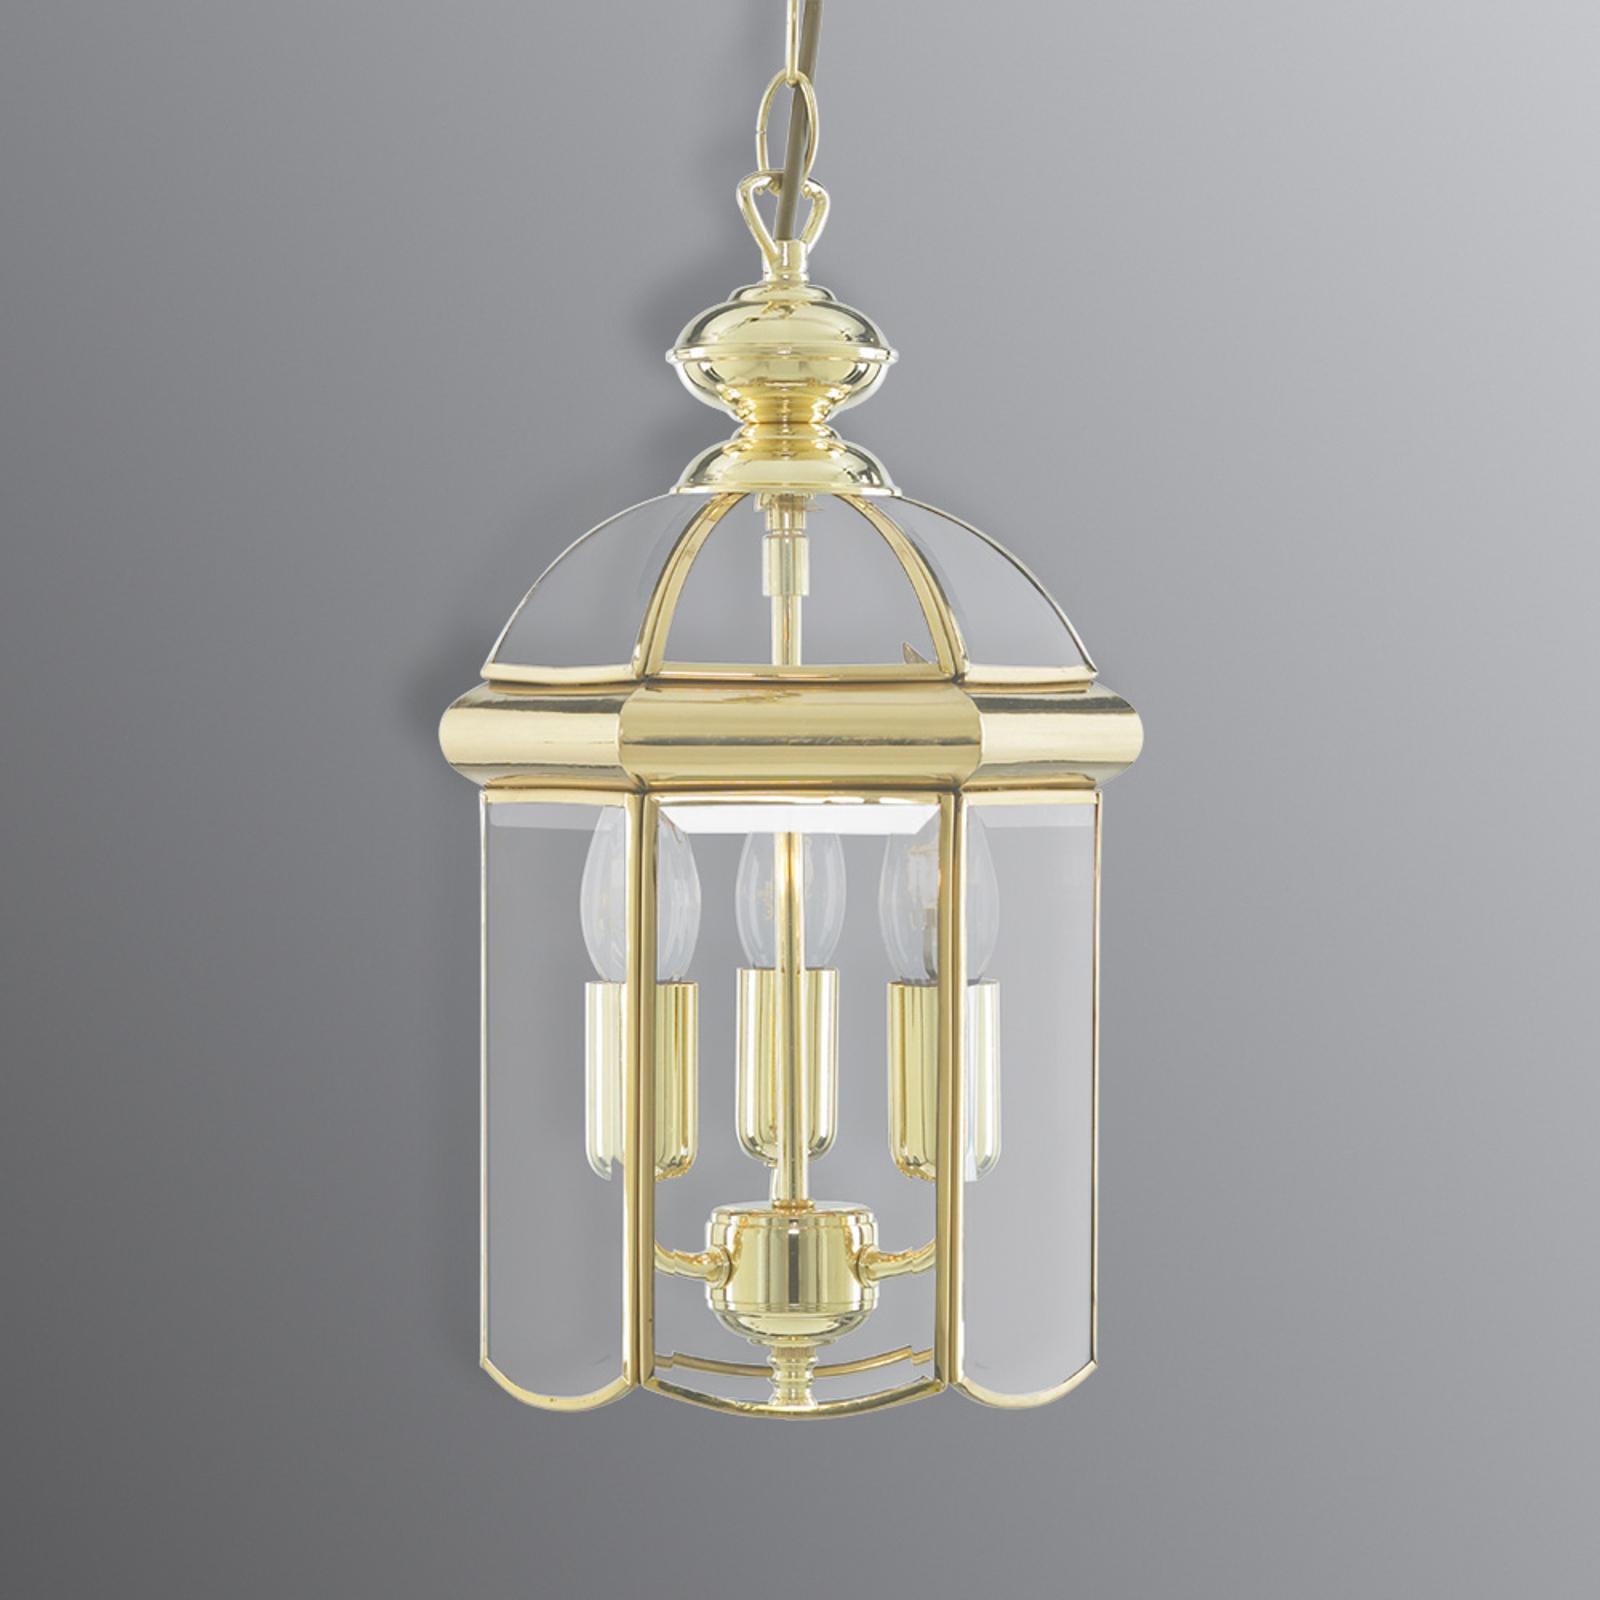 Hængelampe Arlind, Ø 22 cm, messing